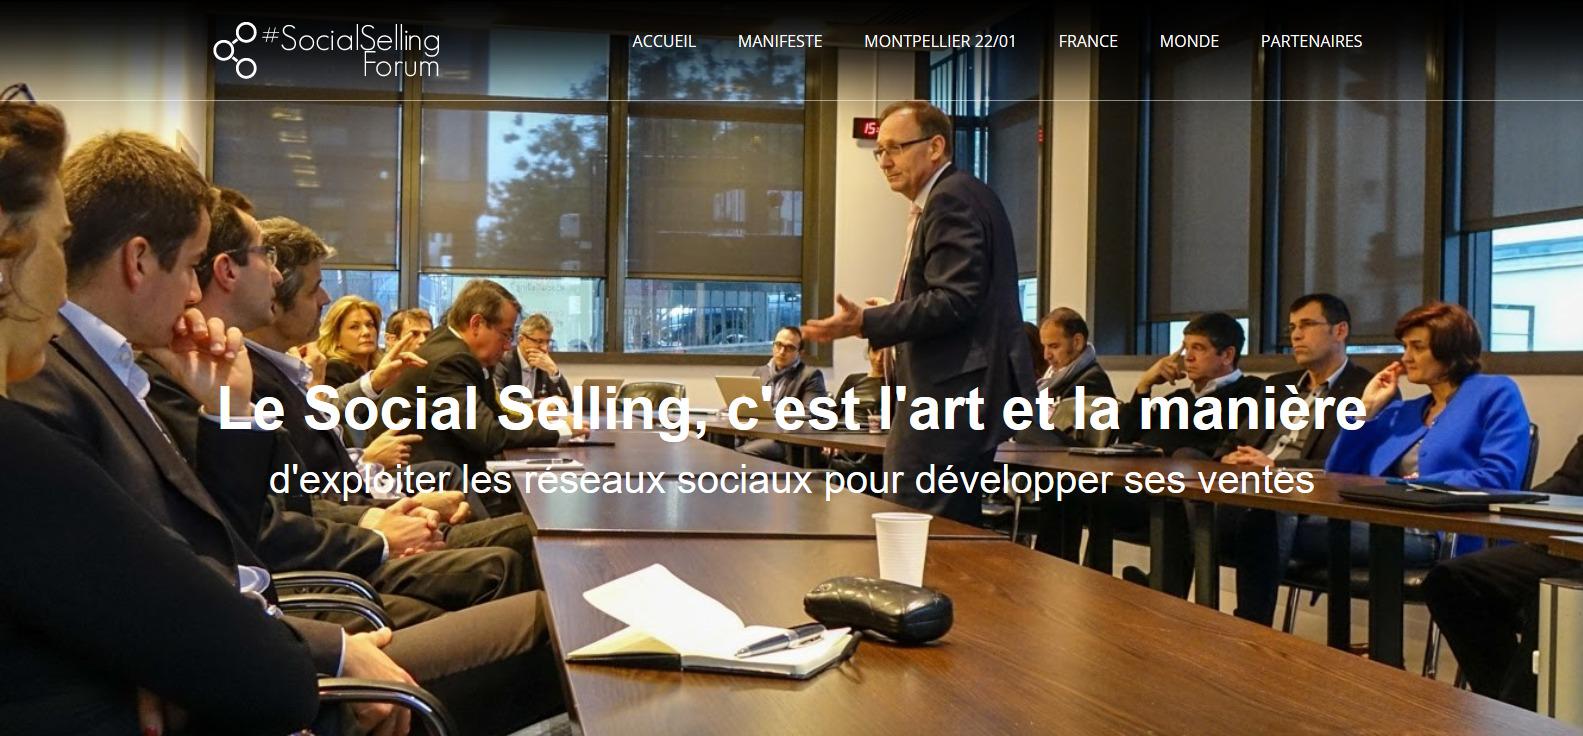 Social Selling Forum Montpellier